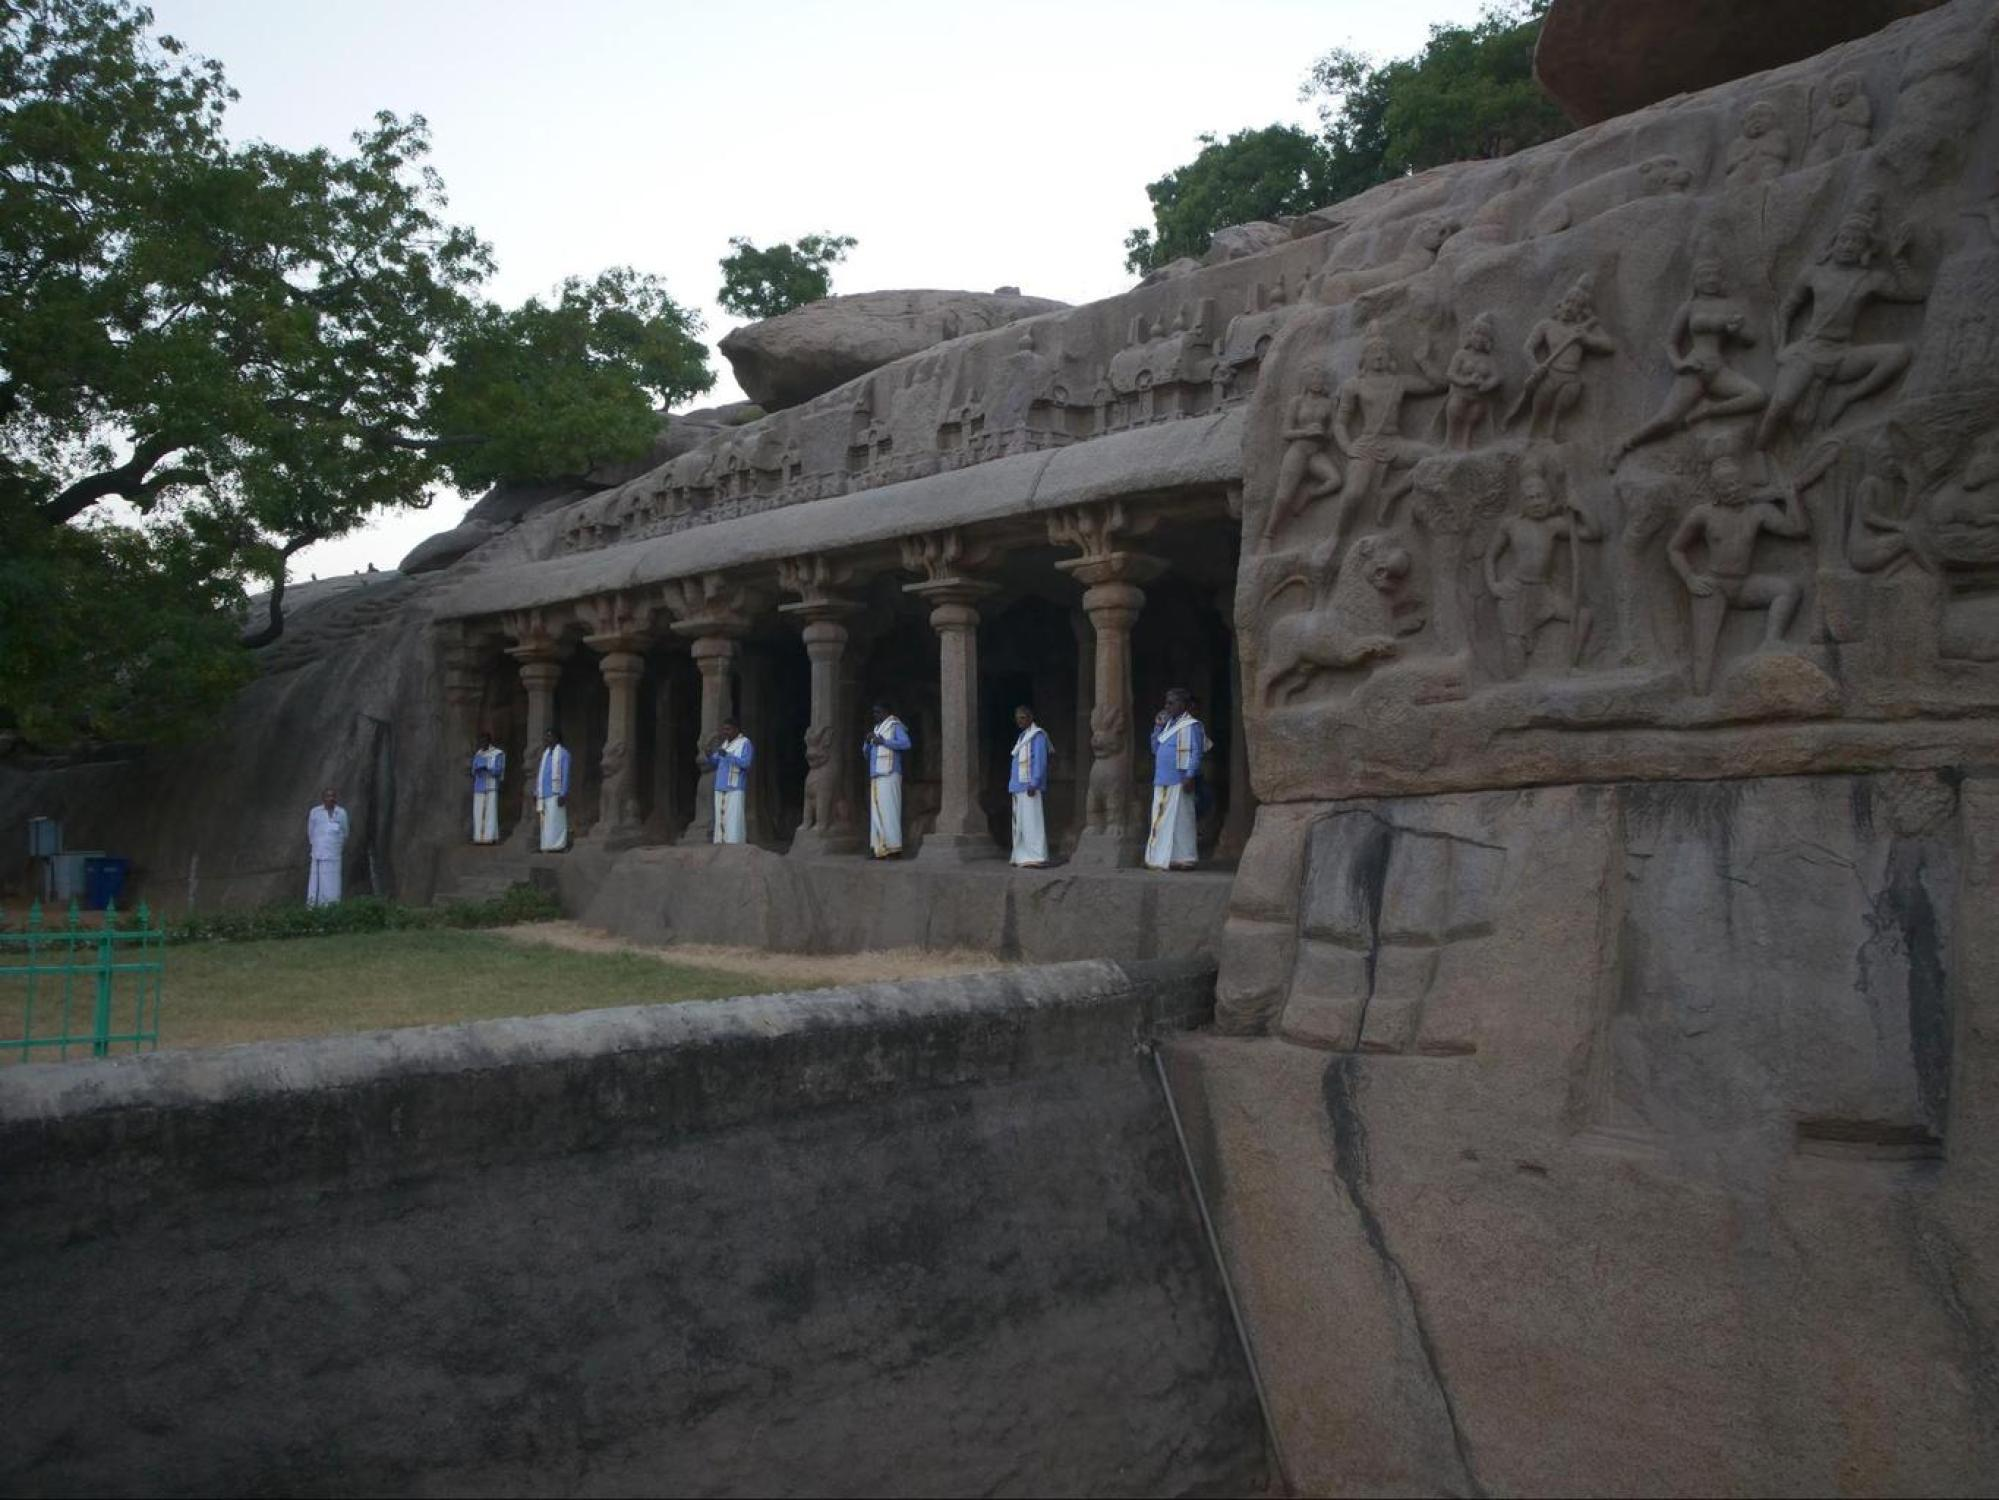 Arjuna's Penance carvings